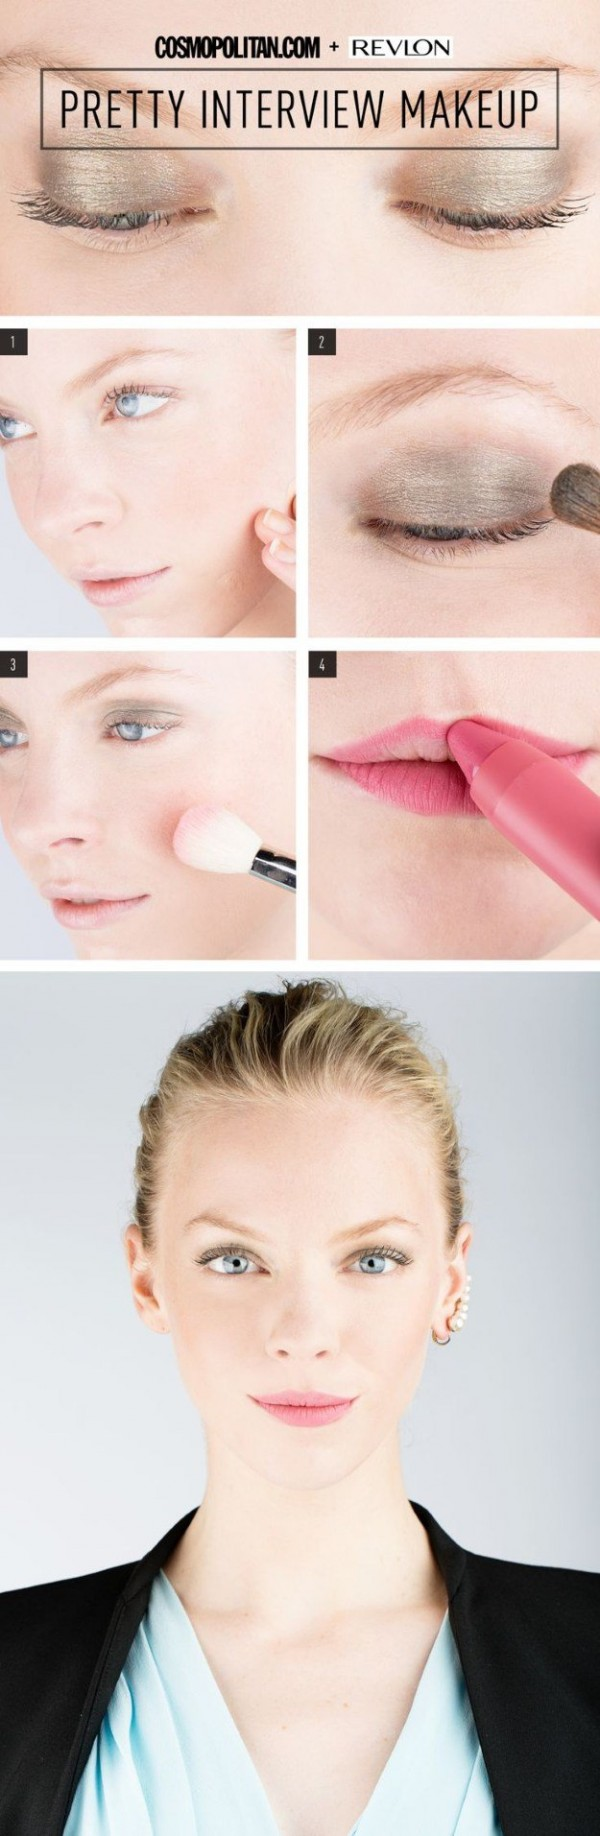 maquillaje simple